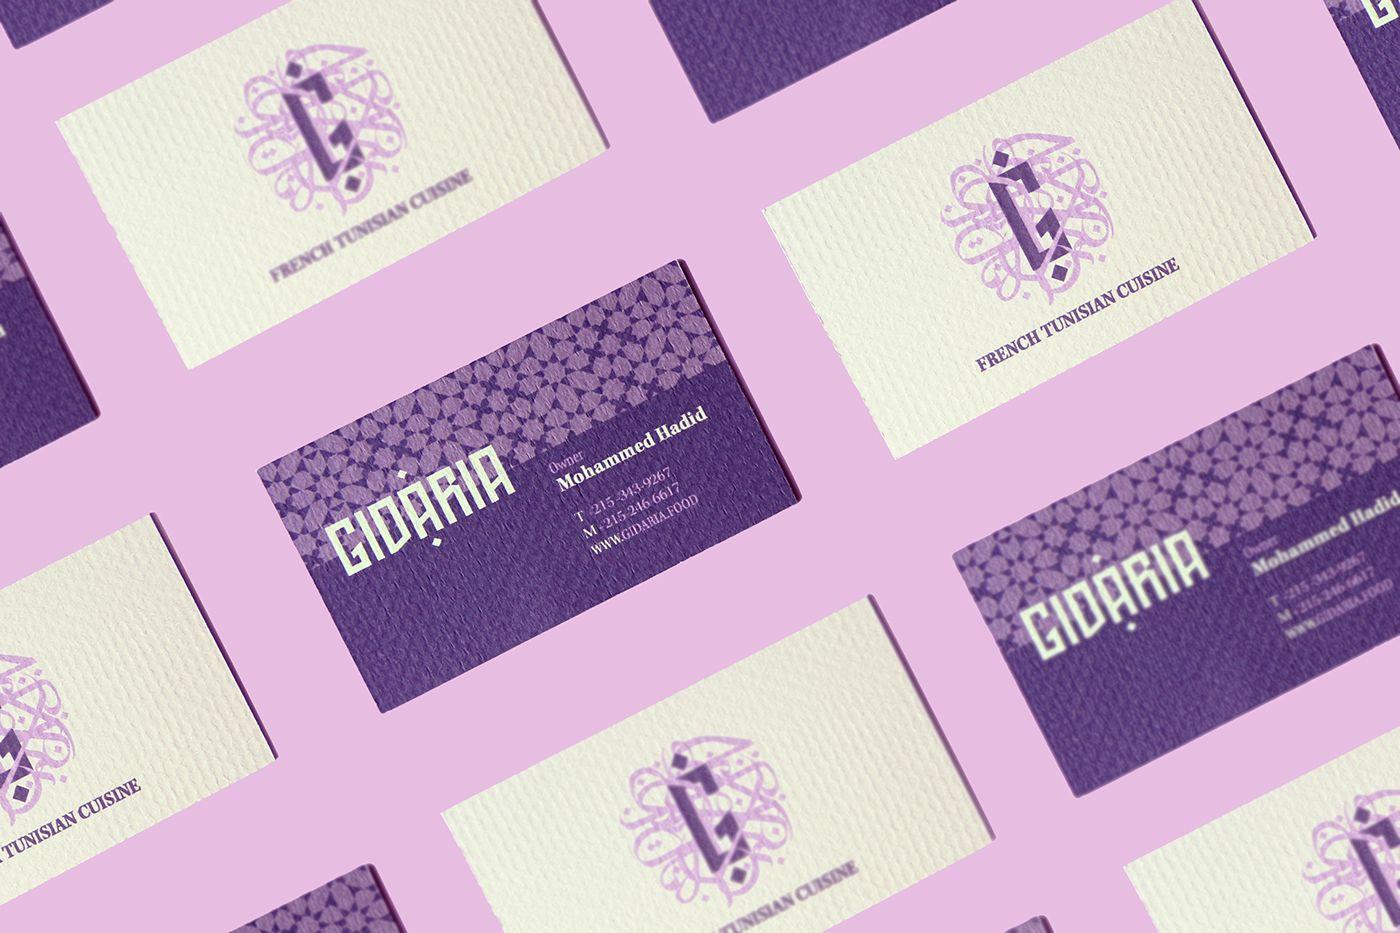 french cafe logo design | arabic restaurant logo design examples